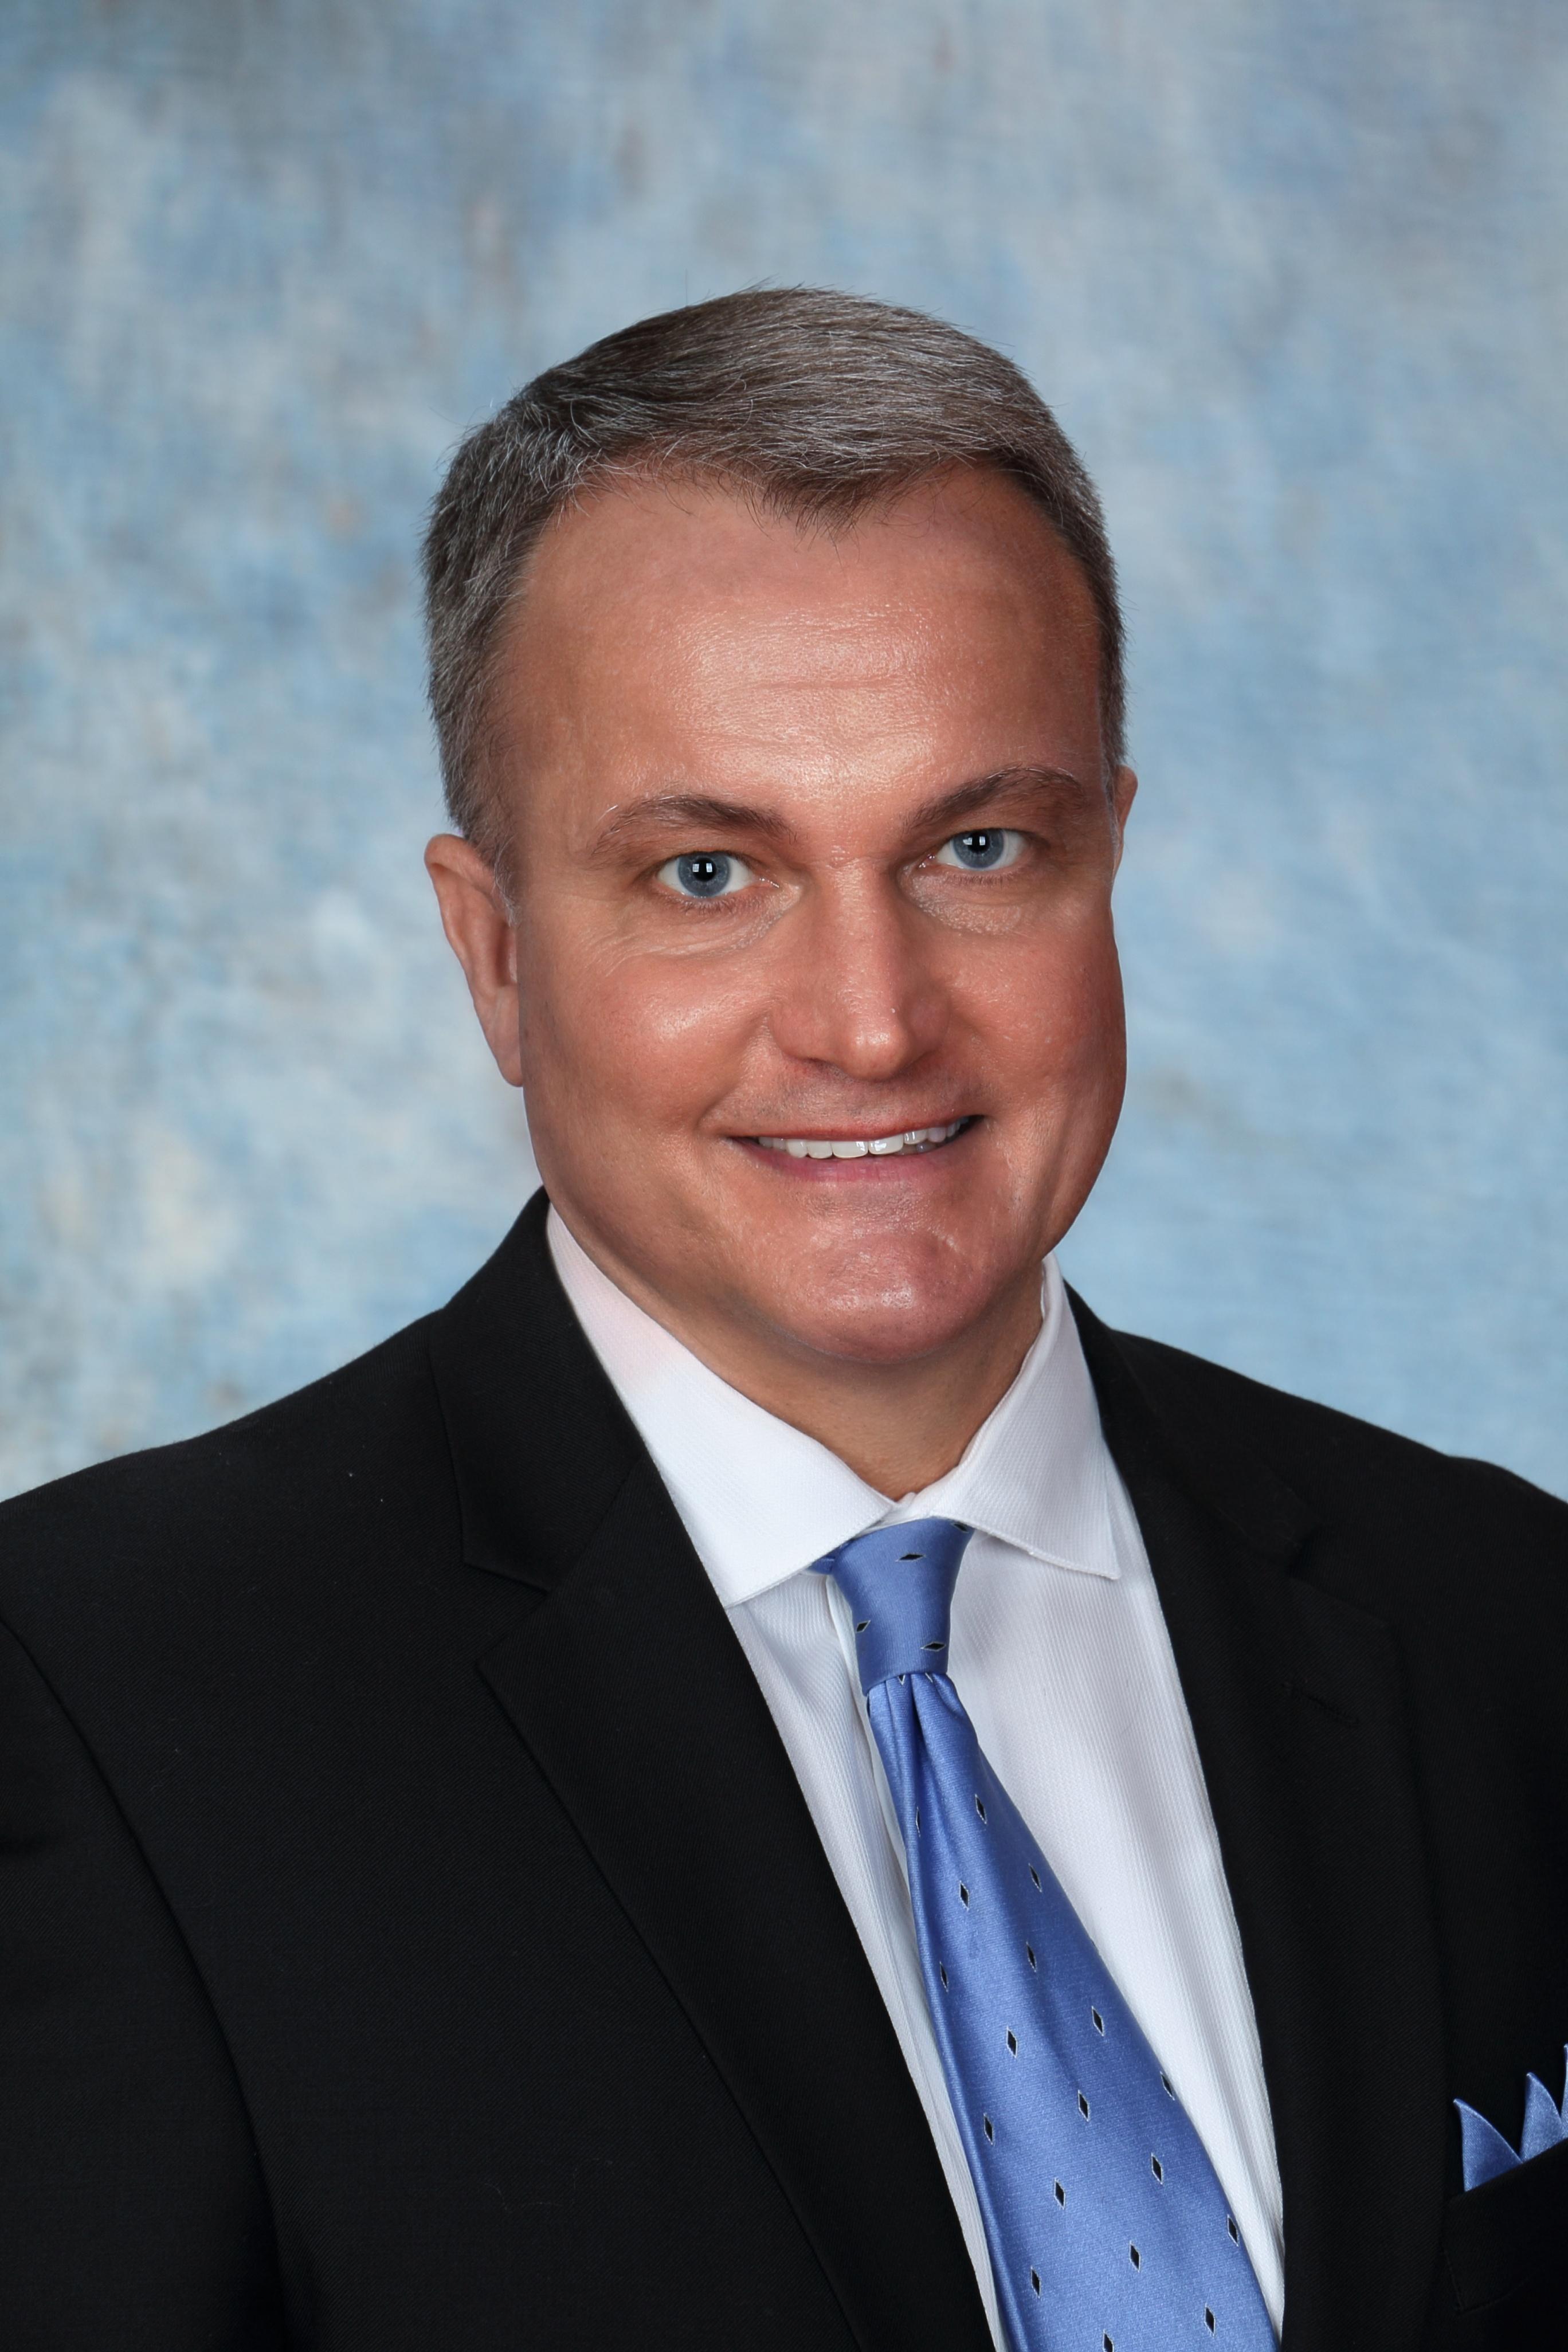 Michael D. Ferguson